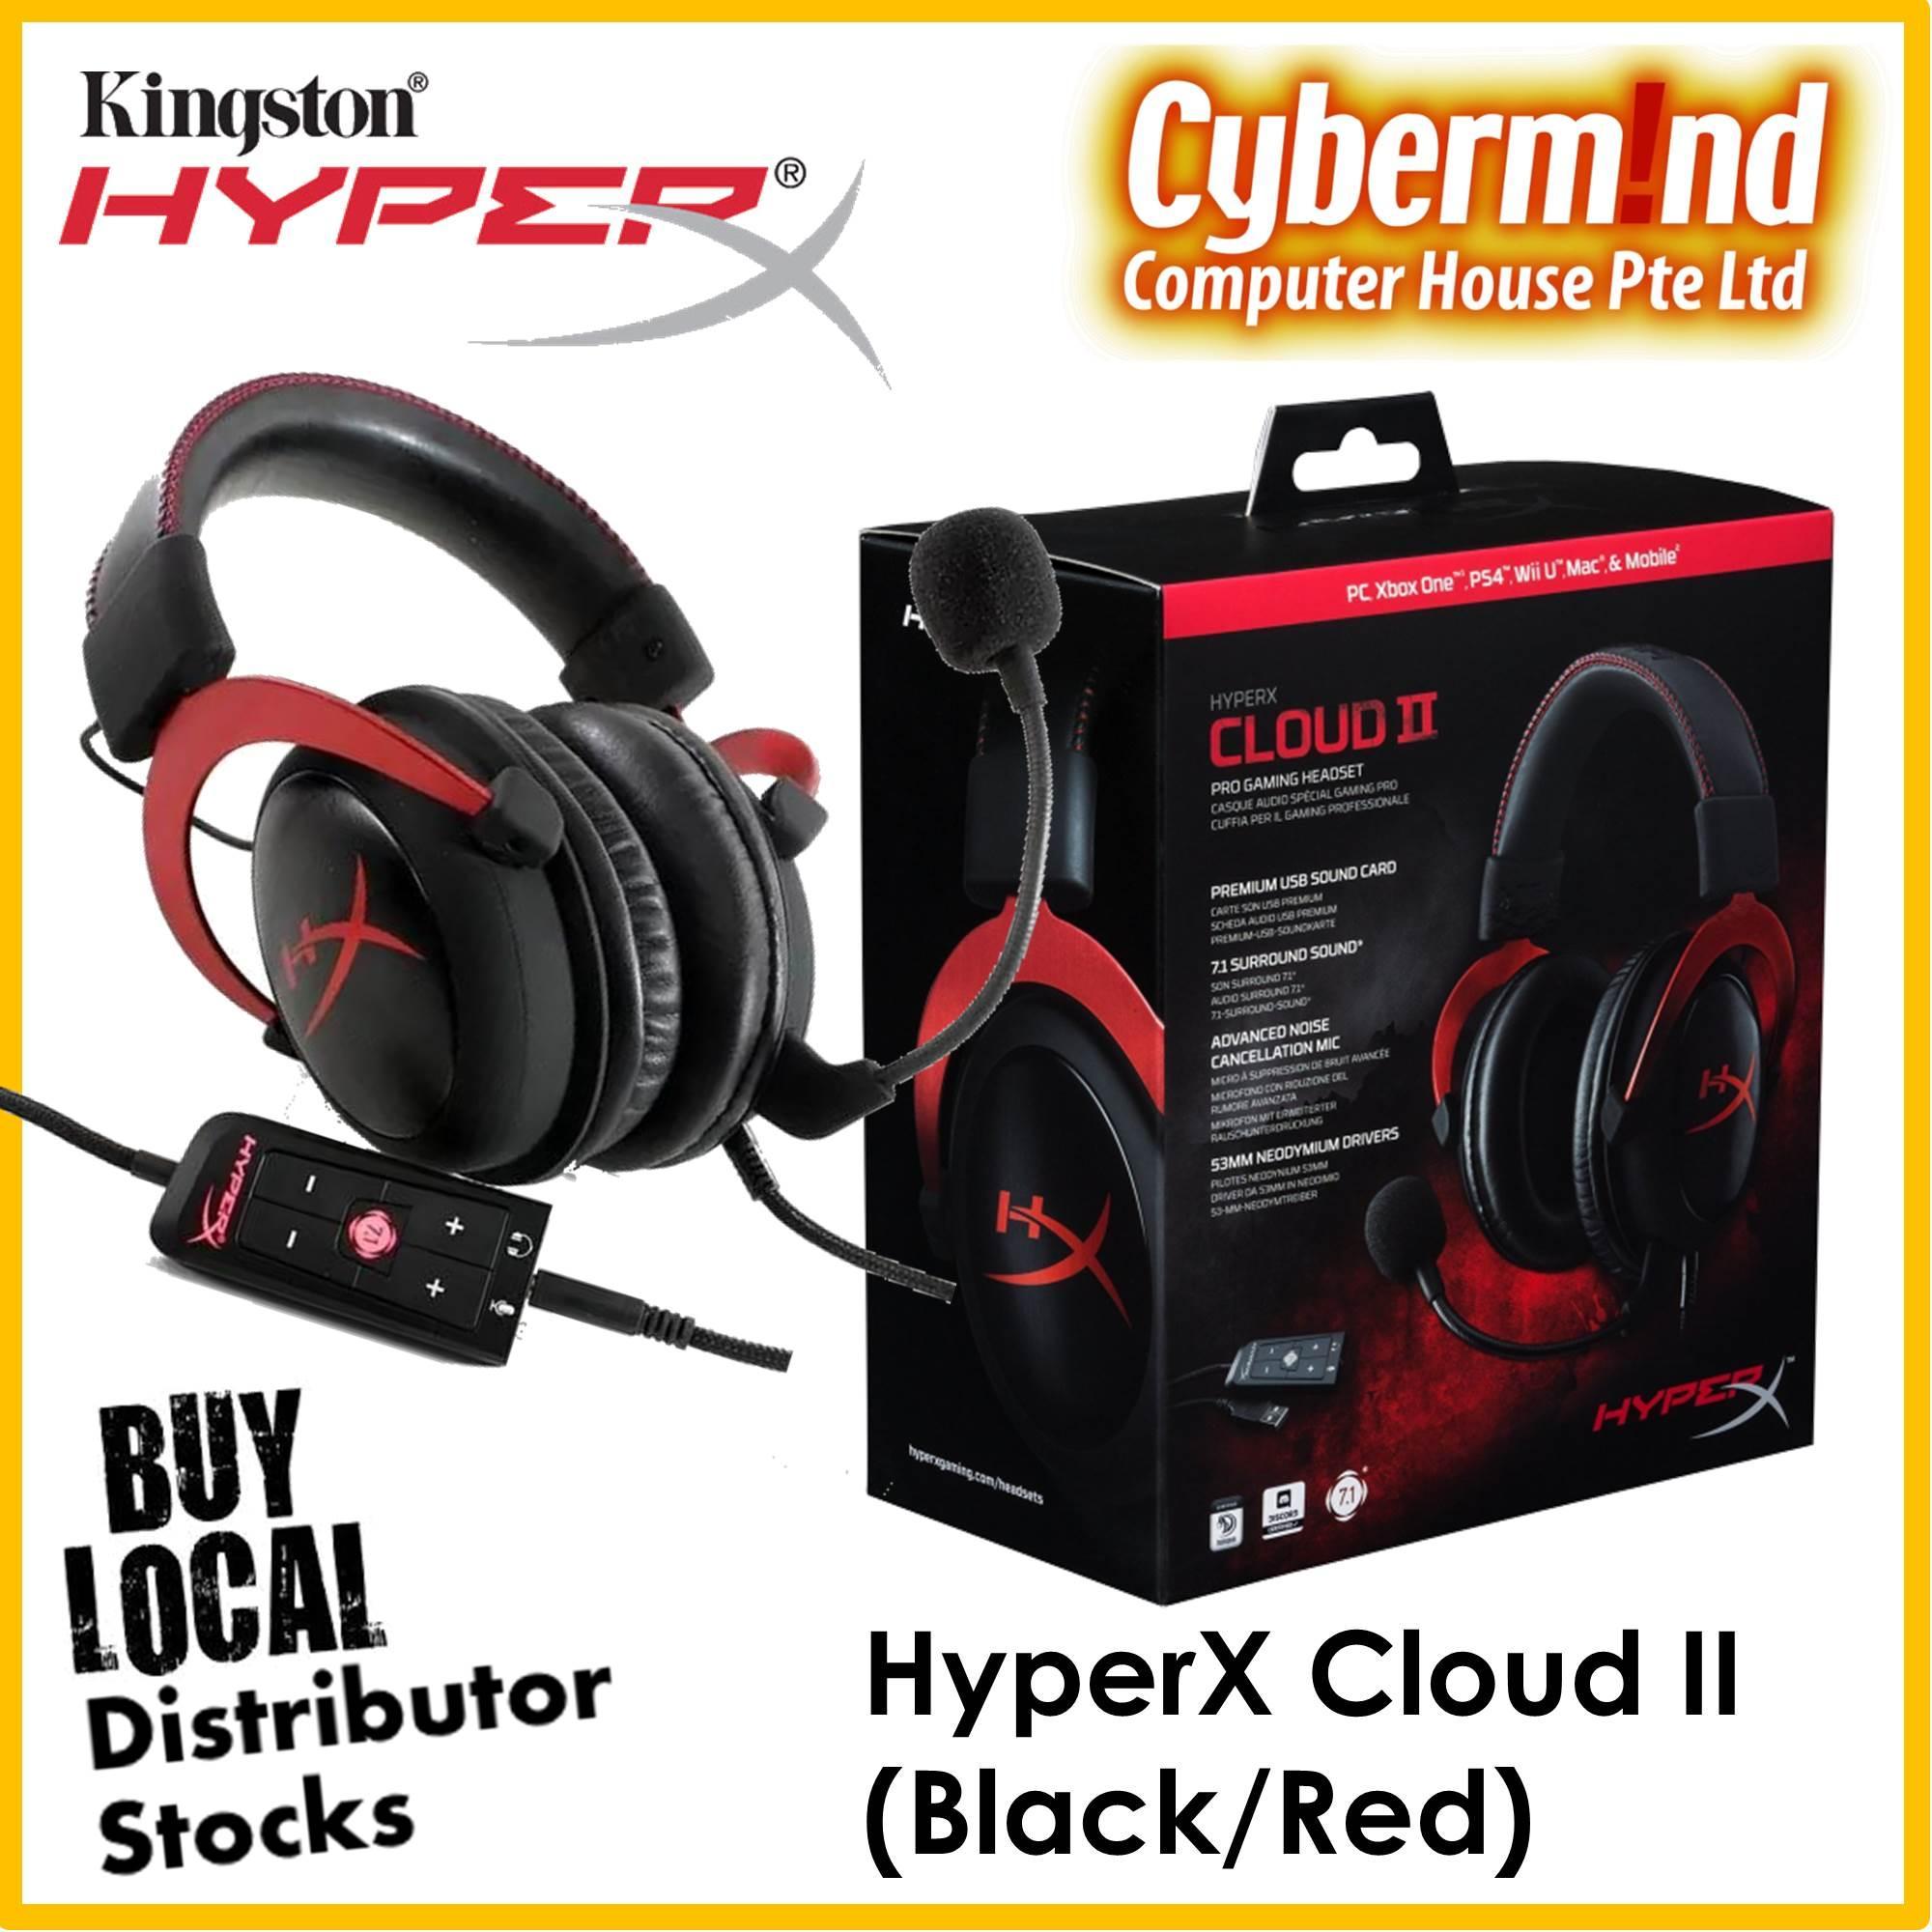 Purchase Kingston Hyperx Cloud Ii Gaming Headset Black Red